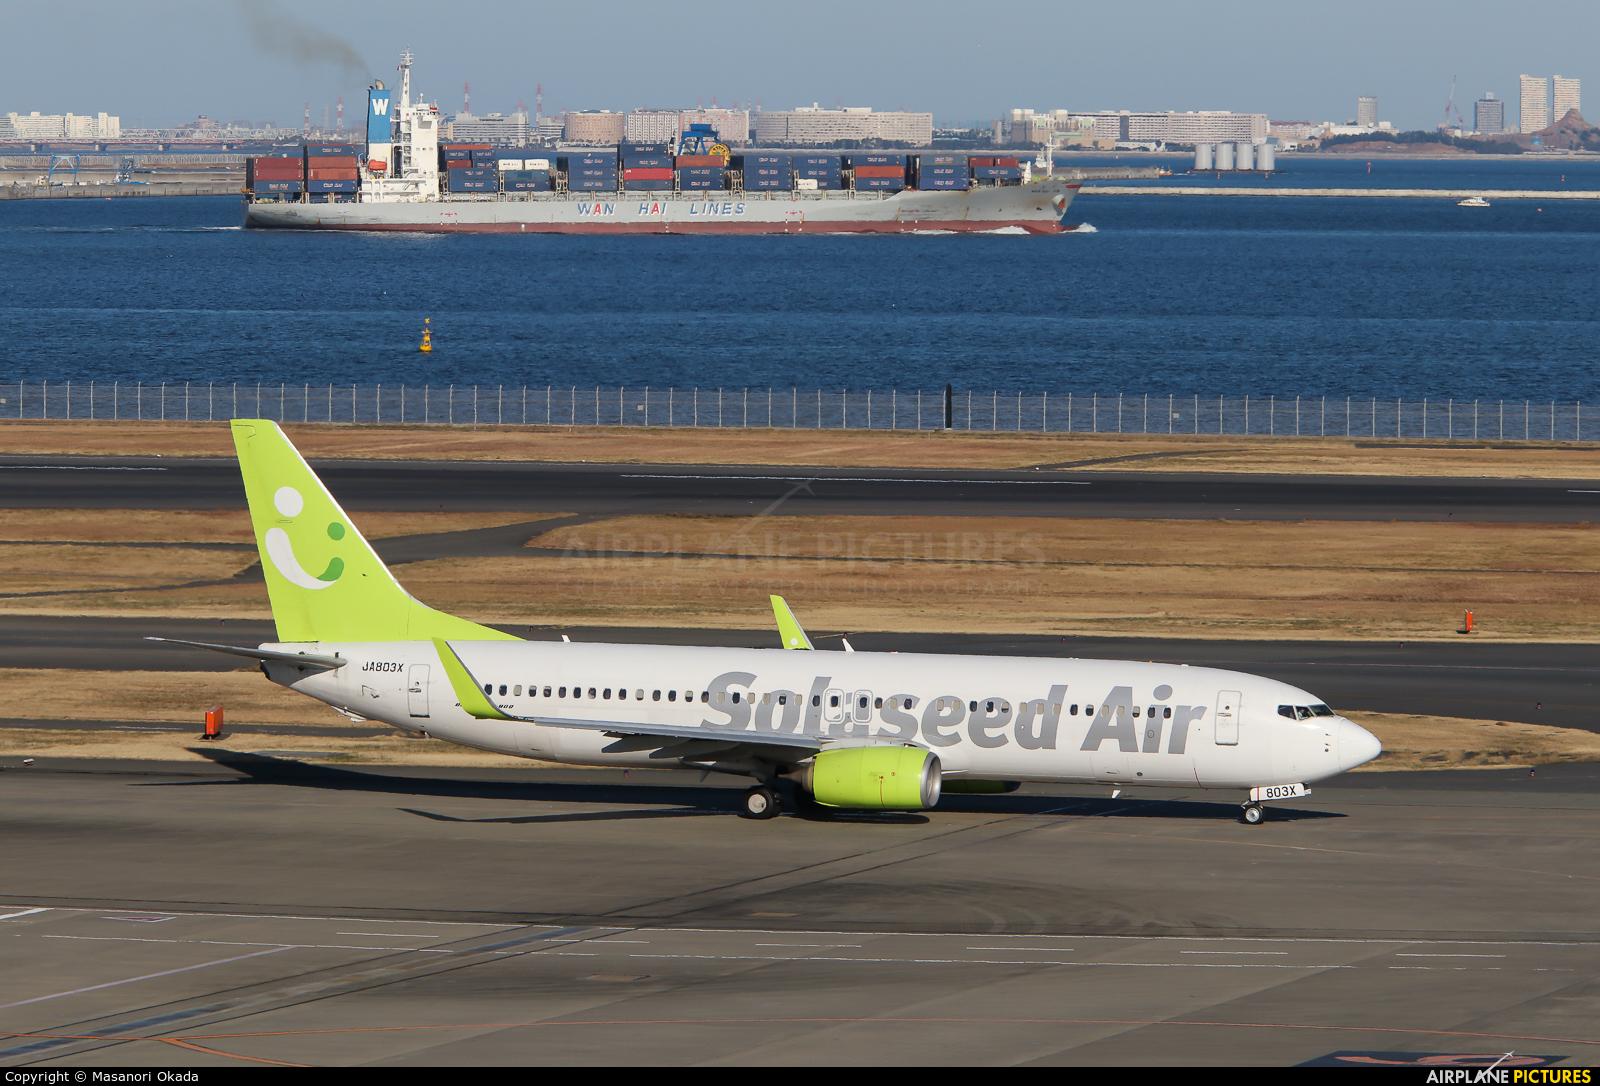 Solaseed Air - Skynet Asia Airways JA803X aircraft at Tokyo - Haneda Intl